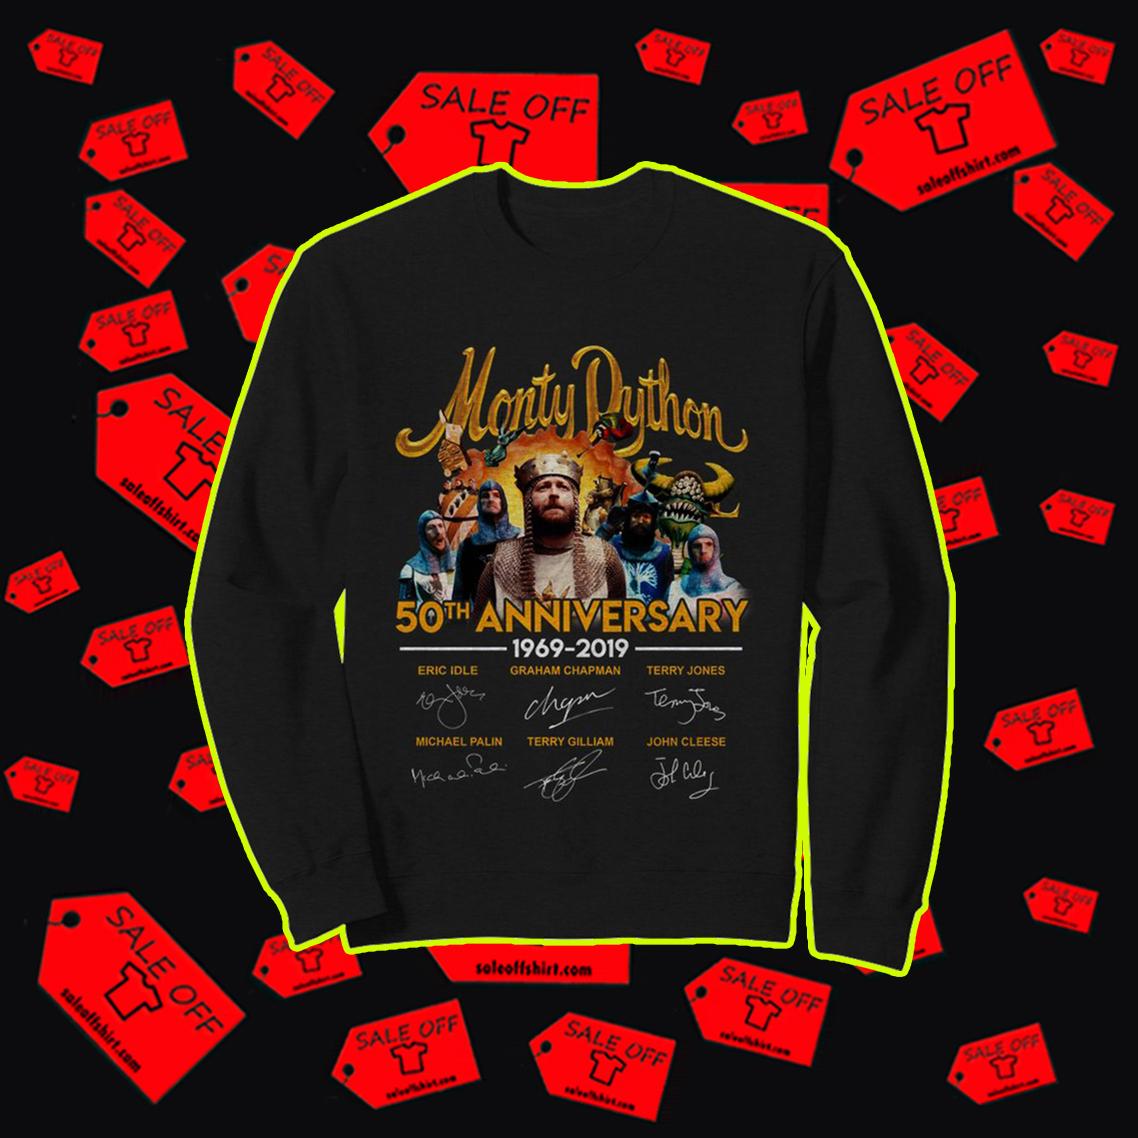 Monty Python 50th anniversary sweatshirt